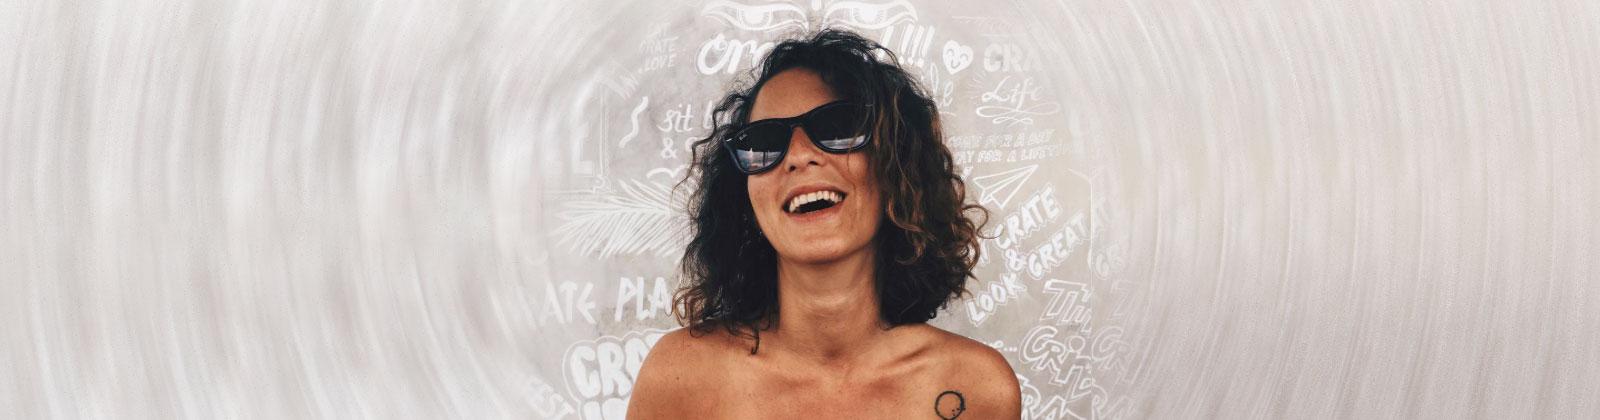 Storyteller Sabrina Andrea Sachs